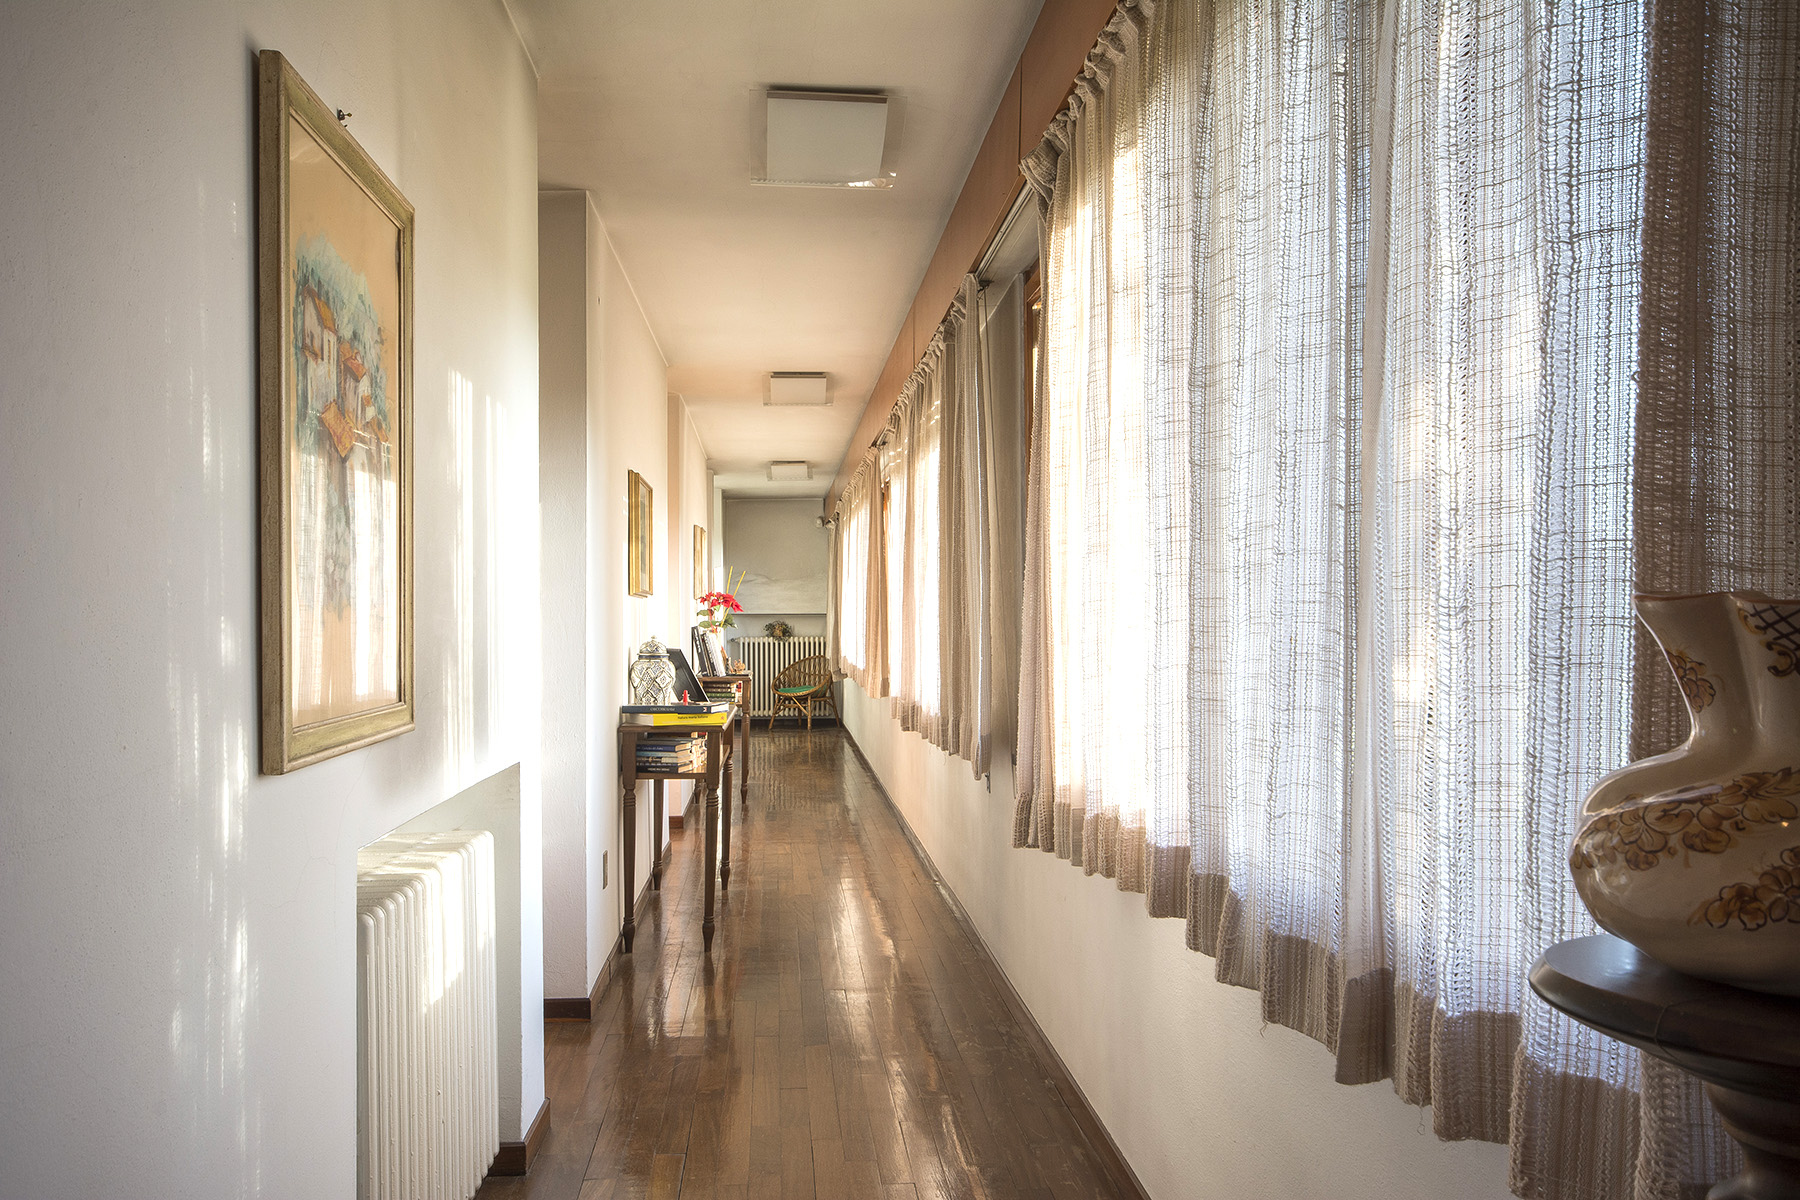 Villa in Vendita a Capannori: 5 locali, 500 mq - Foto 8